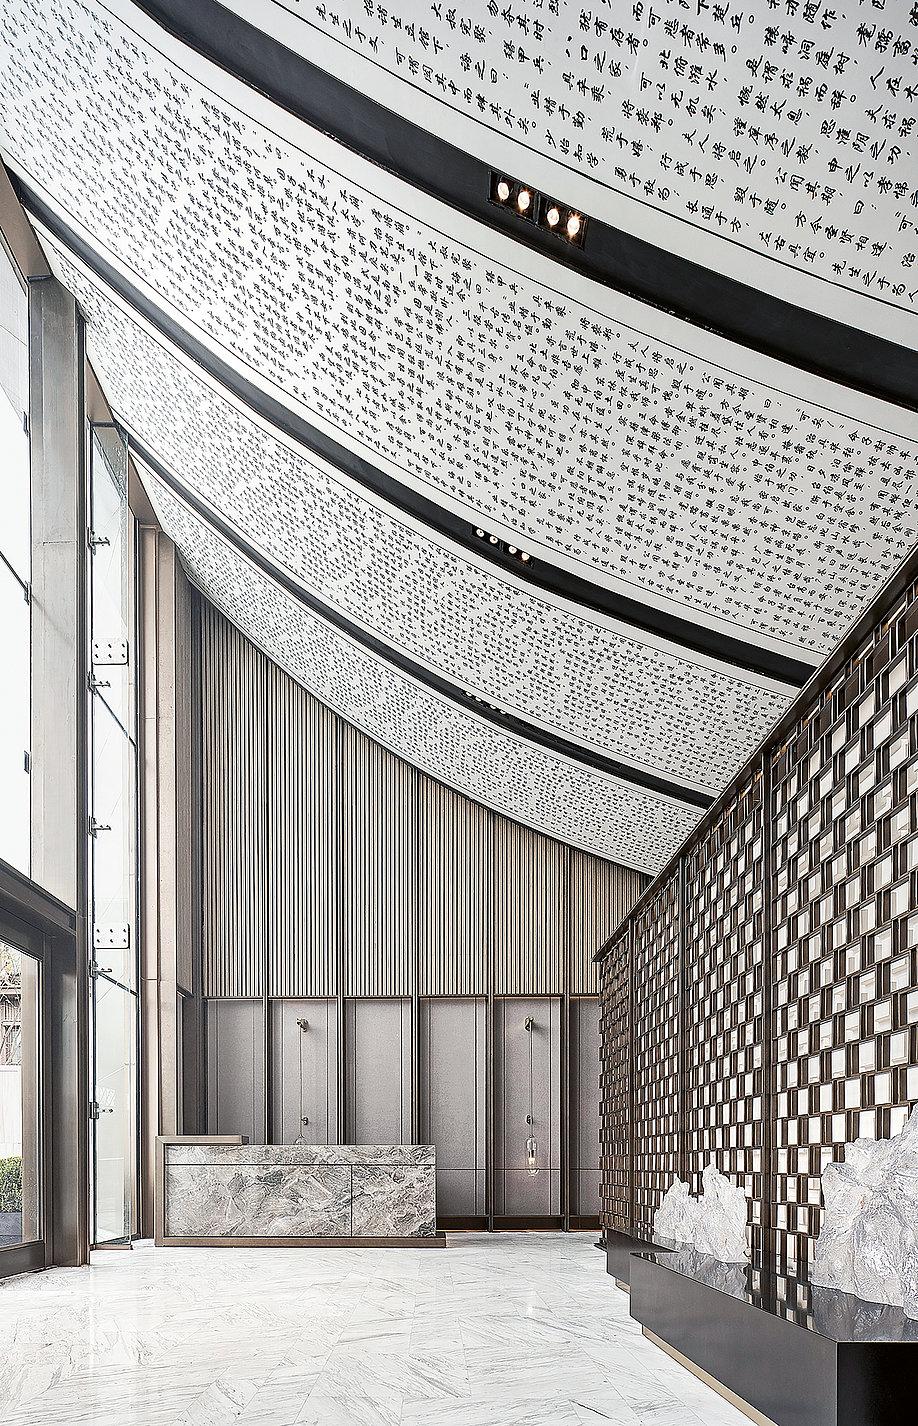 Shui Yue Tang Exhibition Centre | Red Dot Design Award